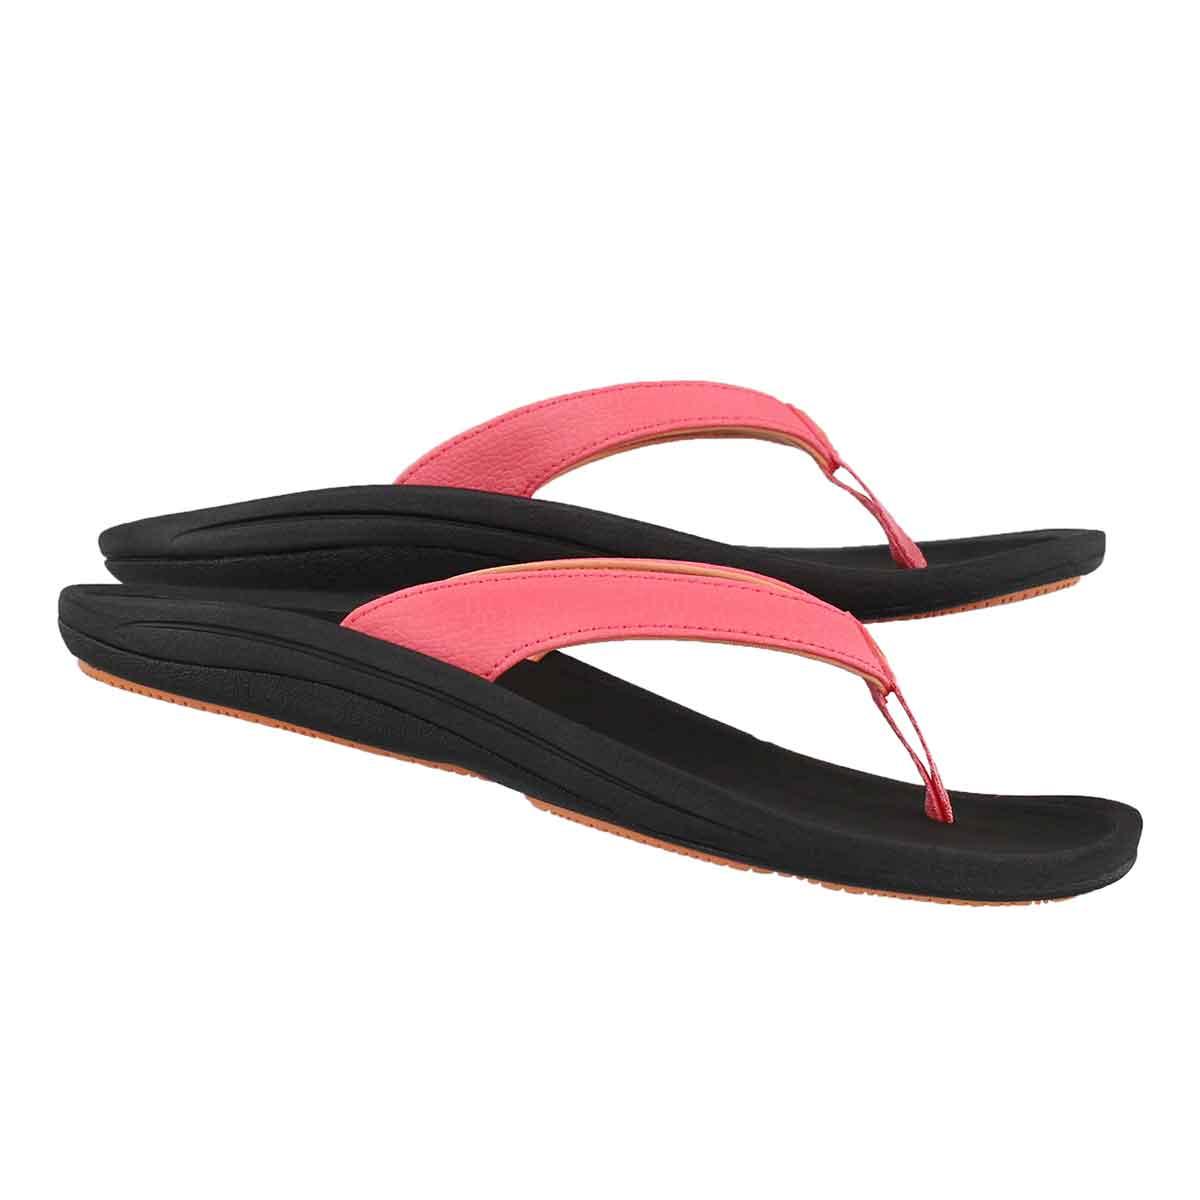 Lds Kulapa Kai guava jelly thong sandal